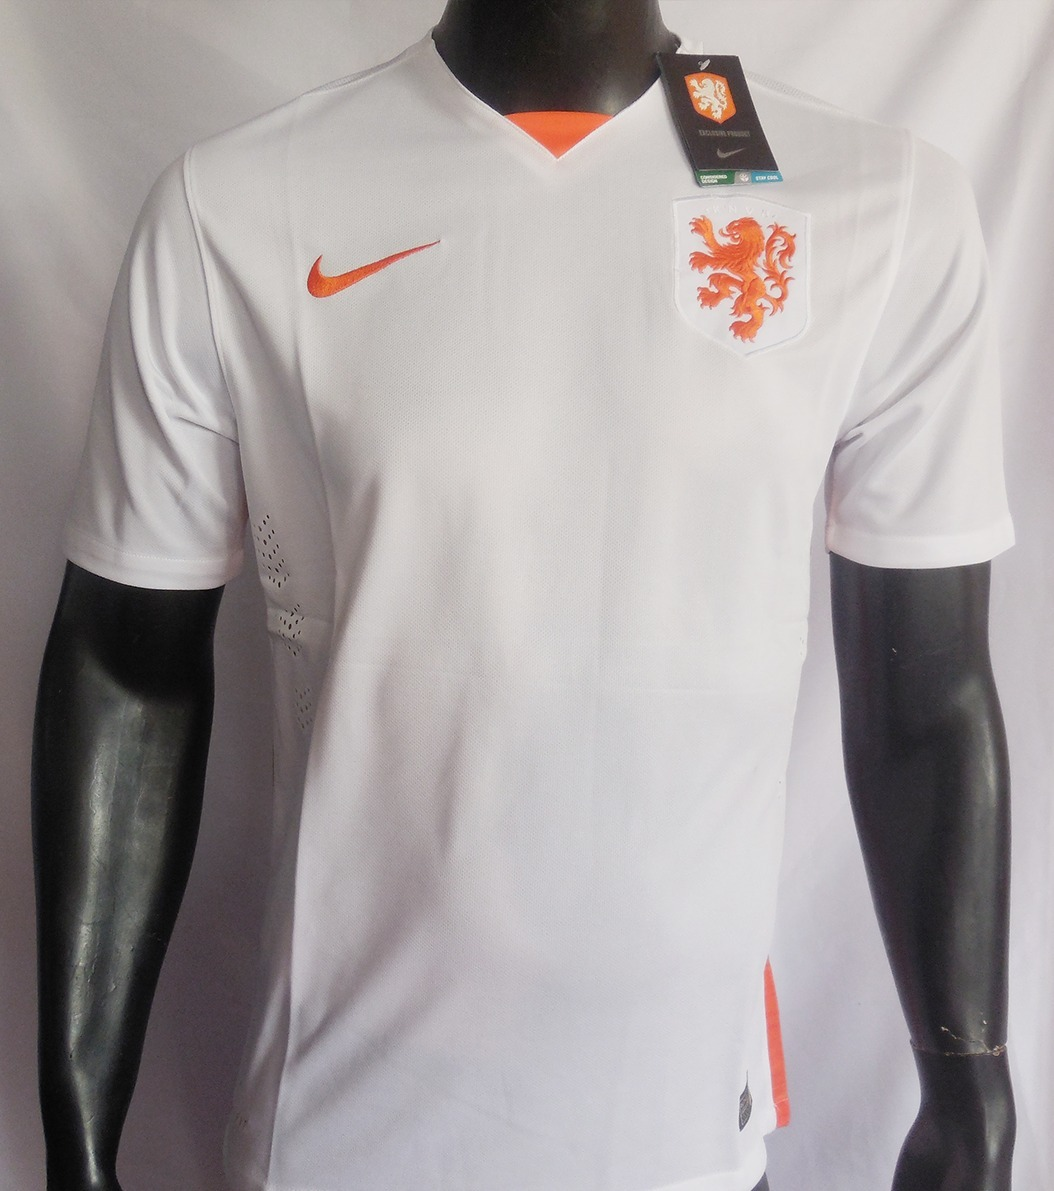 camiseta holanda 2015 2016 away nike. Cargando zoom. 20e1402a8a405